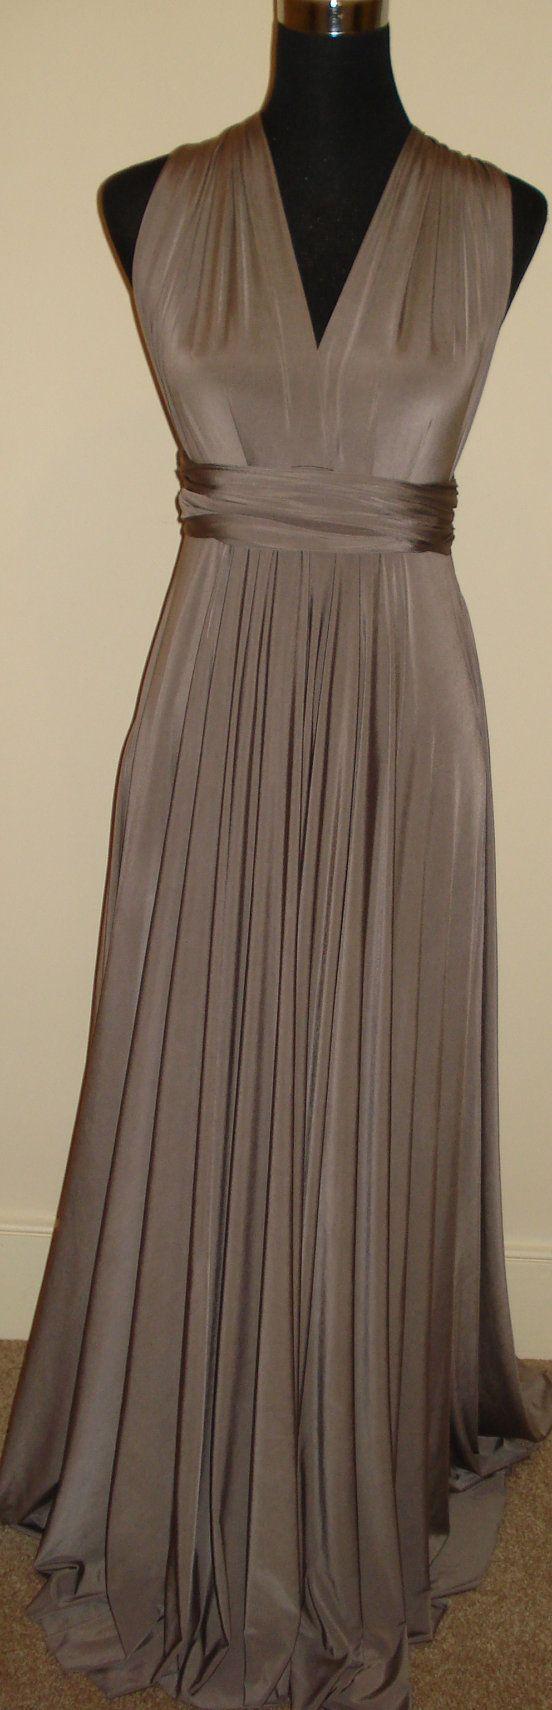 Best 25 mocha bridesmaid dresses ideas on pinterest grape mocha bridesmaid dress prom formal evening dress by stitchawayrose ombrellifo Images